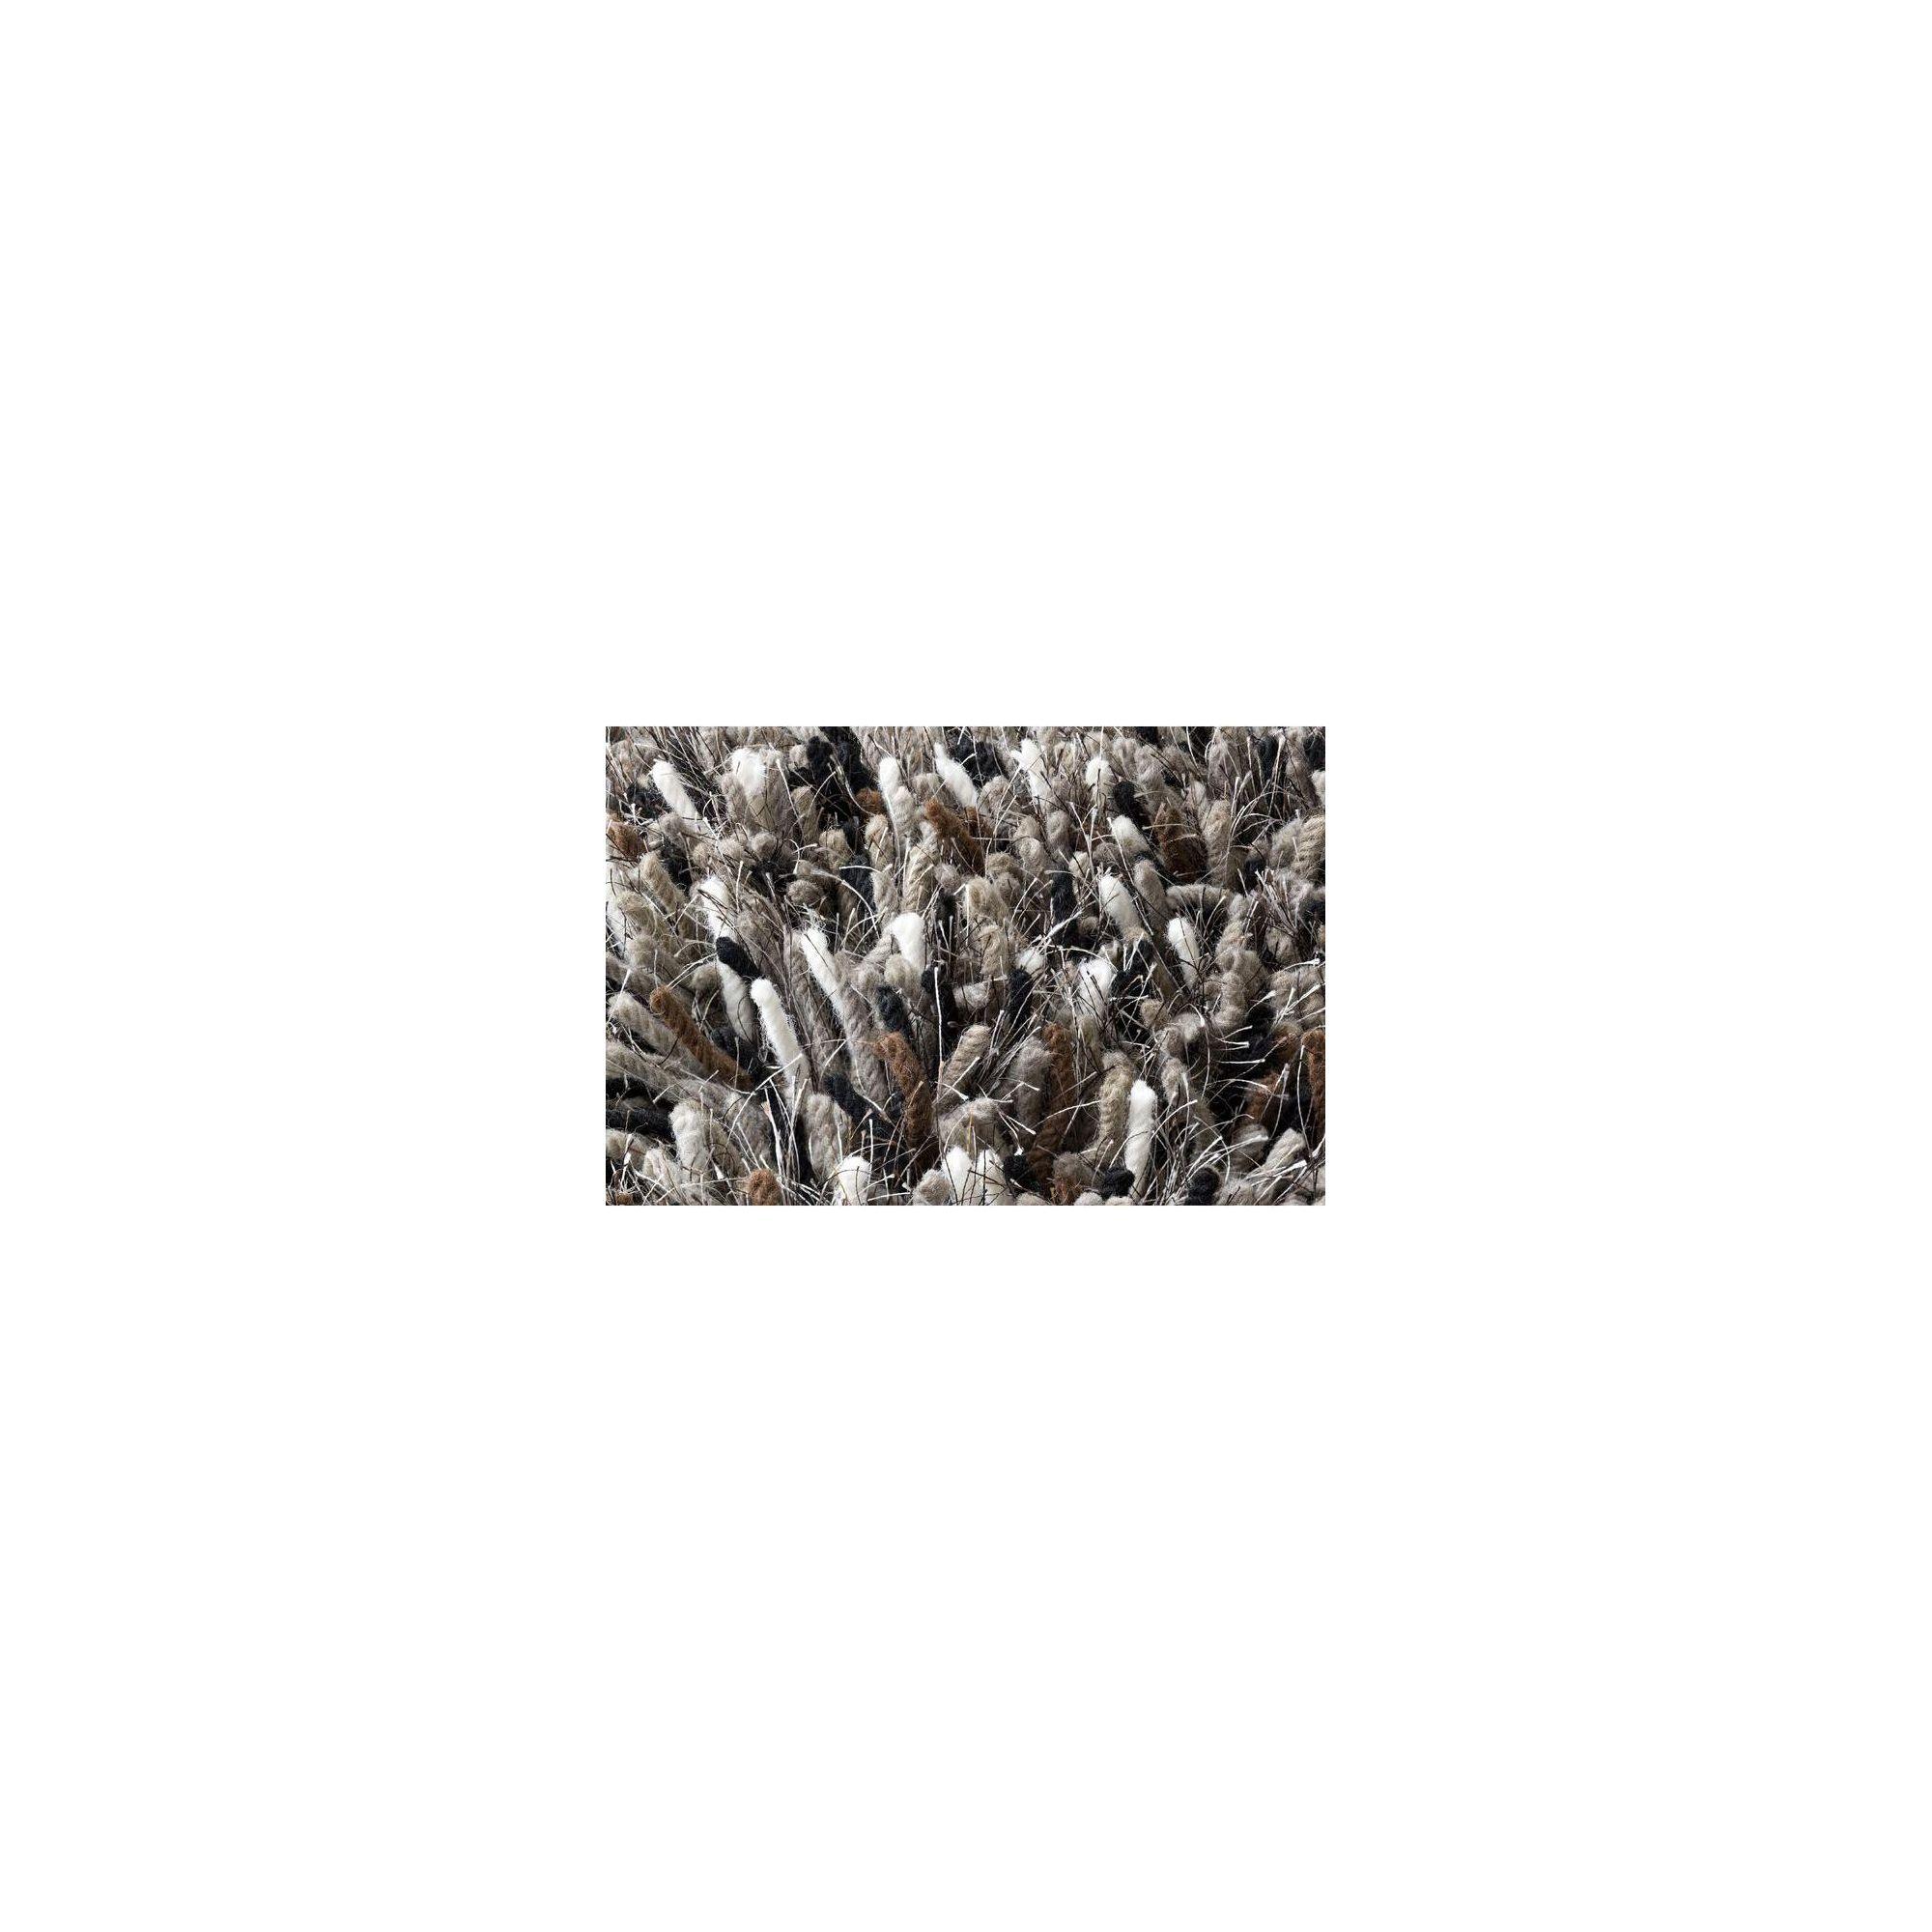 Linie Design Betona Grey Shag Rug - 200cm x 140cm at Tesco Direct